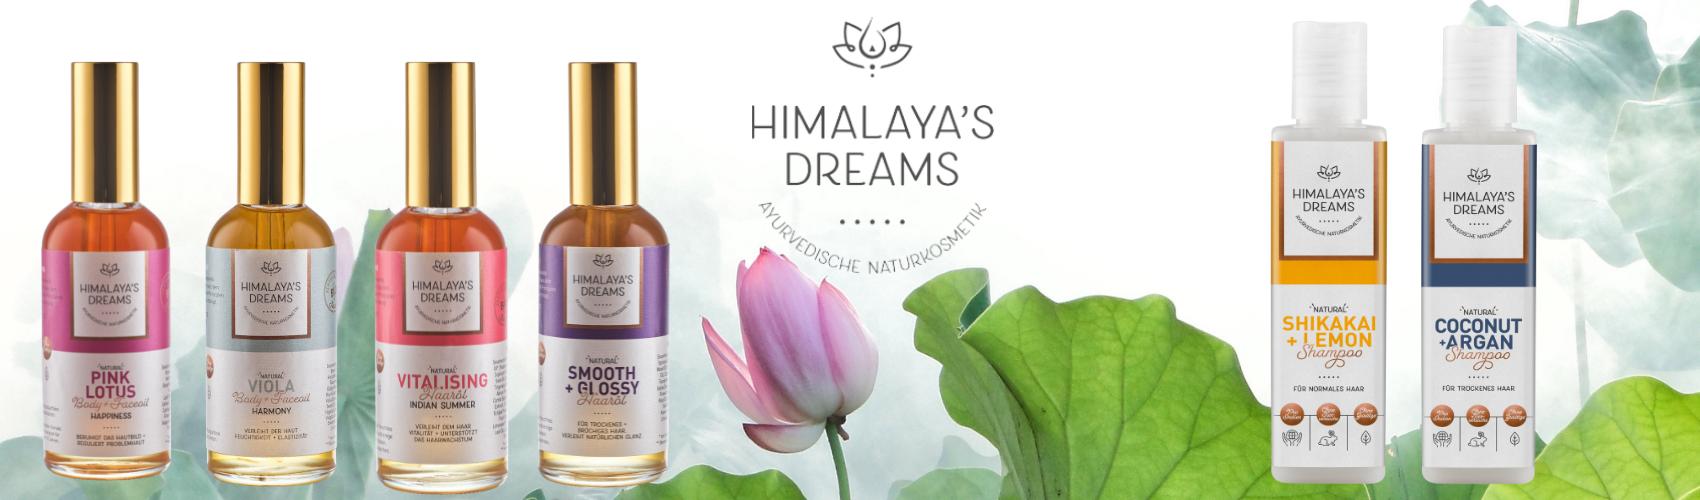 Himalaya's Dreams Summer 2021